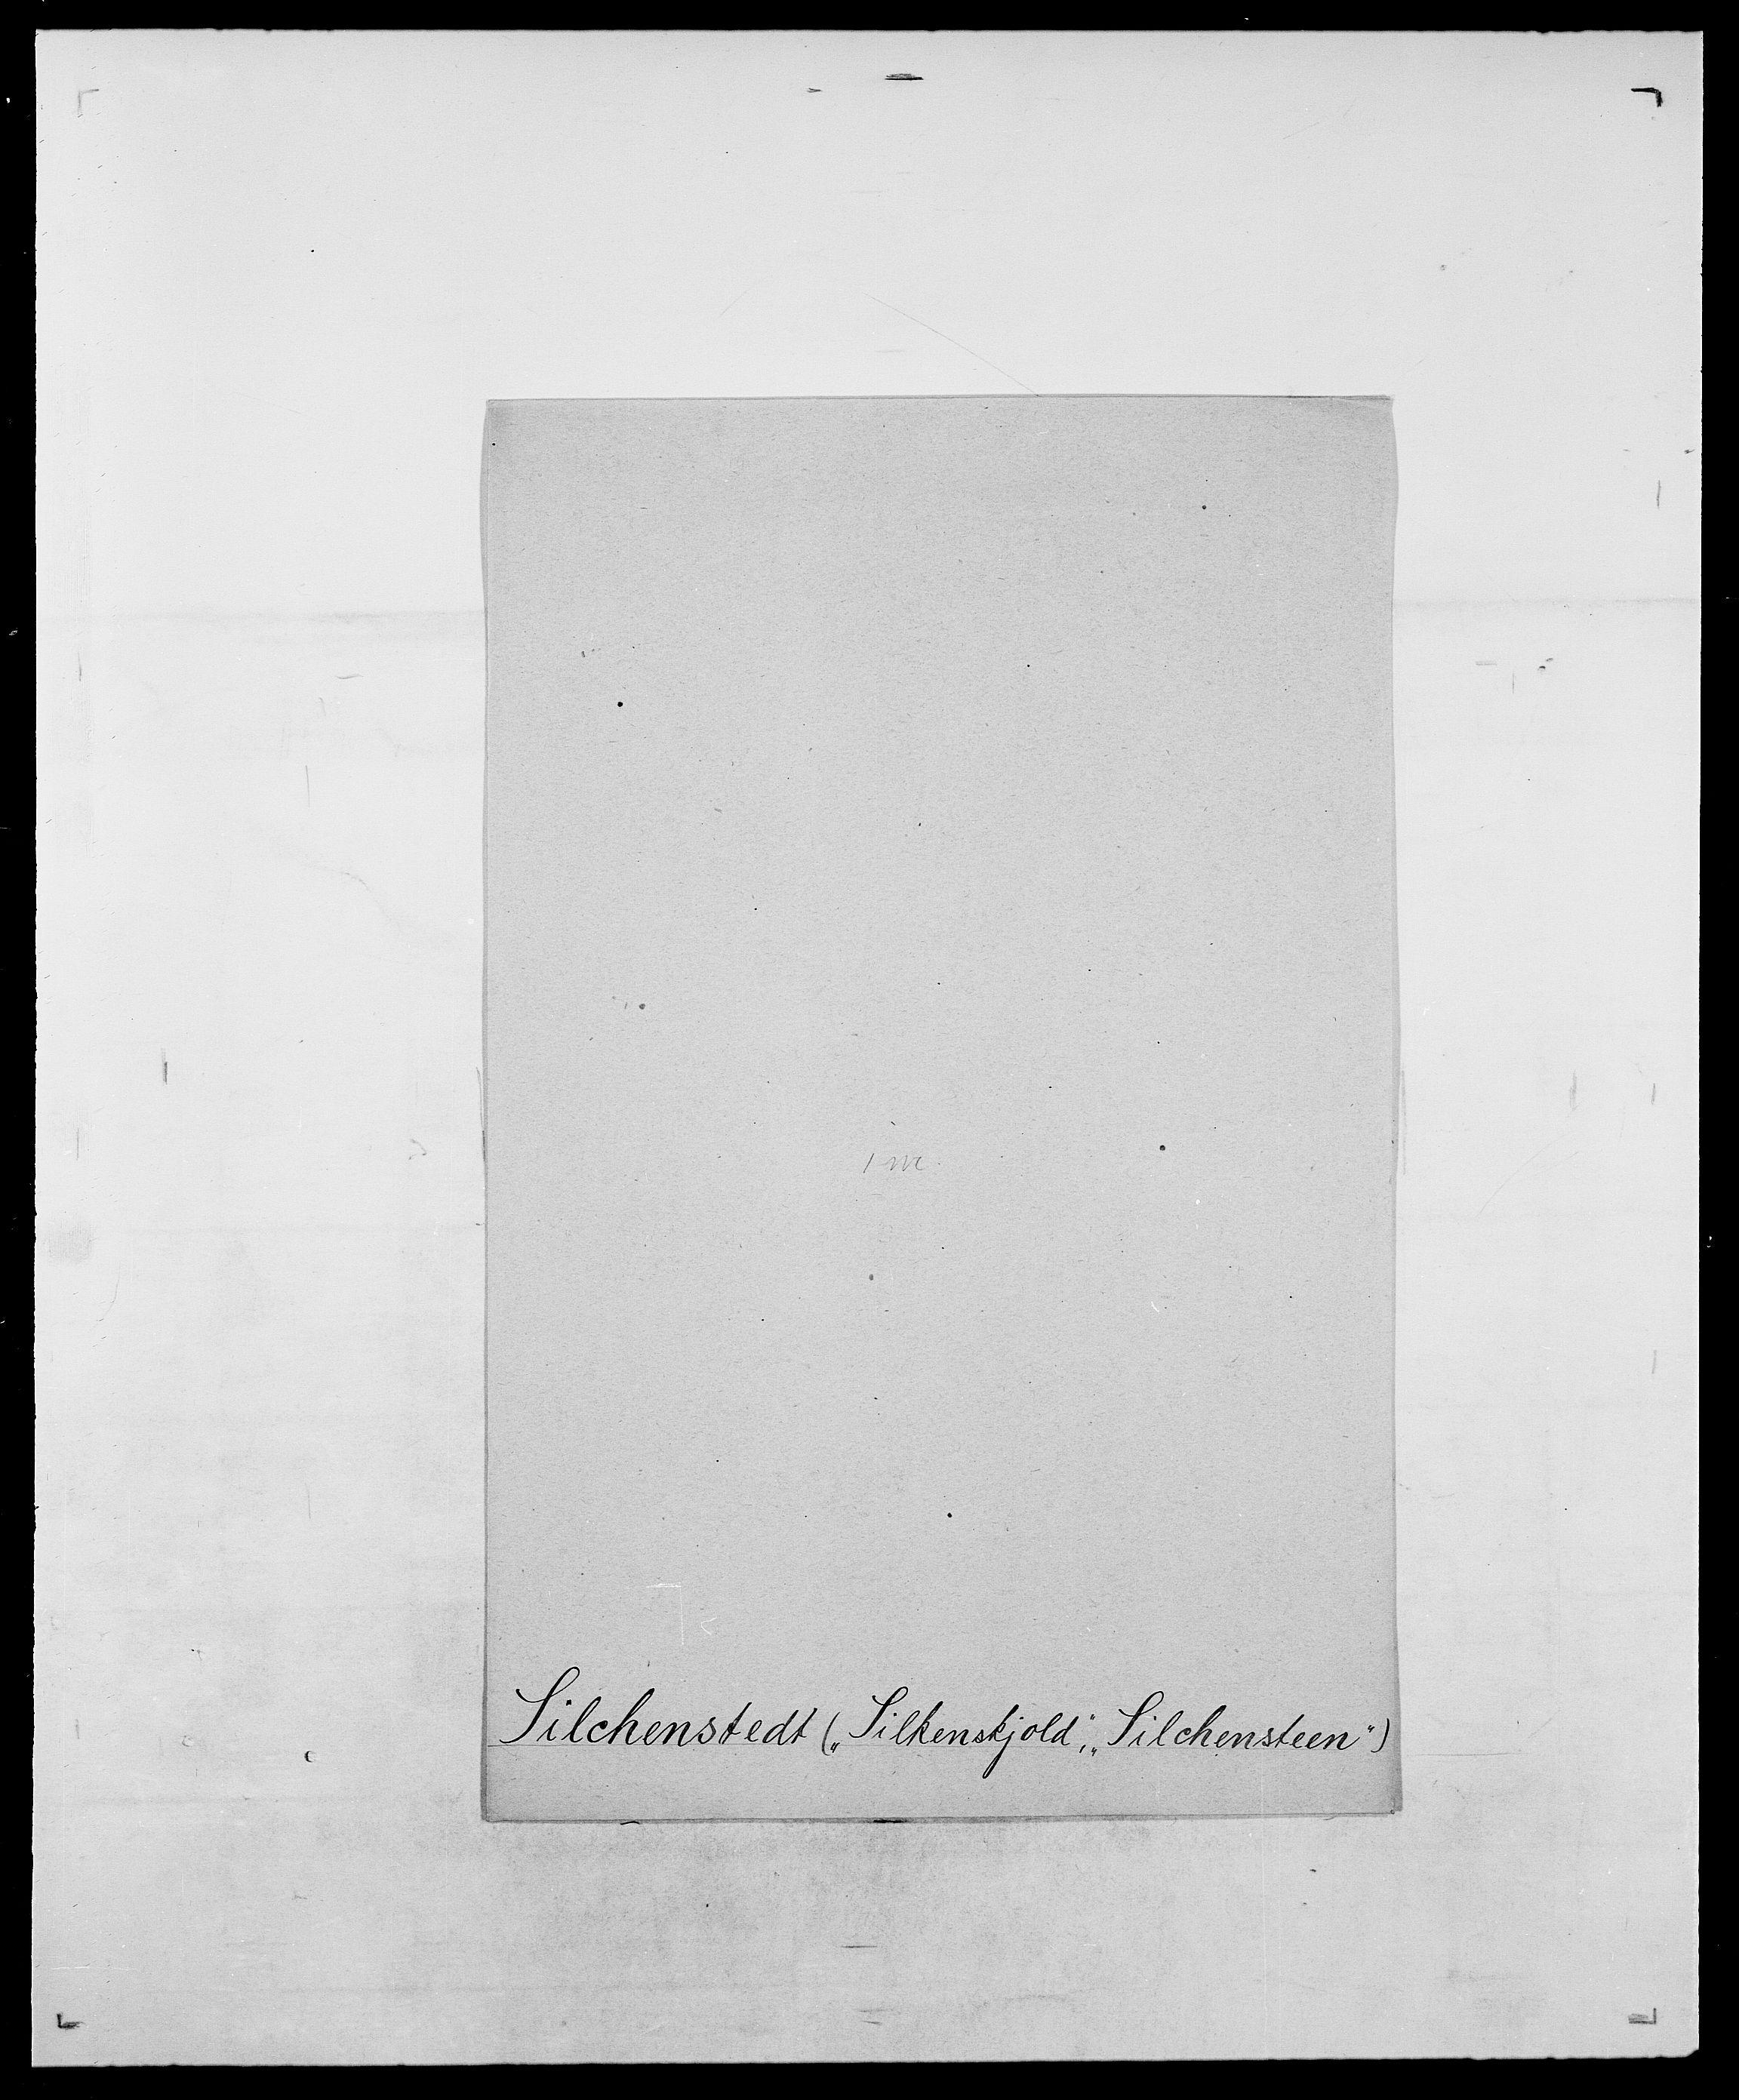 SAO, Delgobe, Charles Antoine - samling, D/Da/L0035: Schnabel - sjetman, s. 793